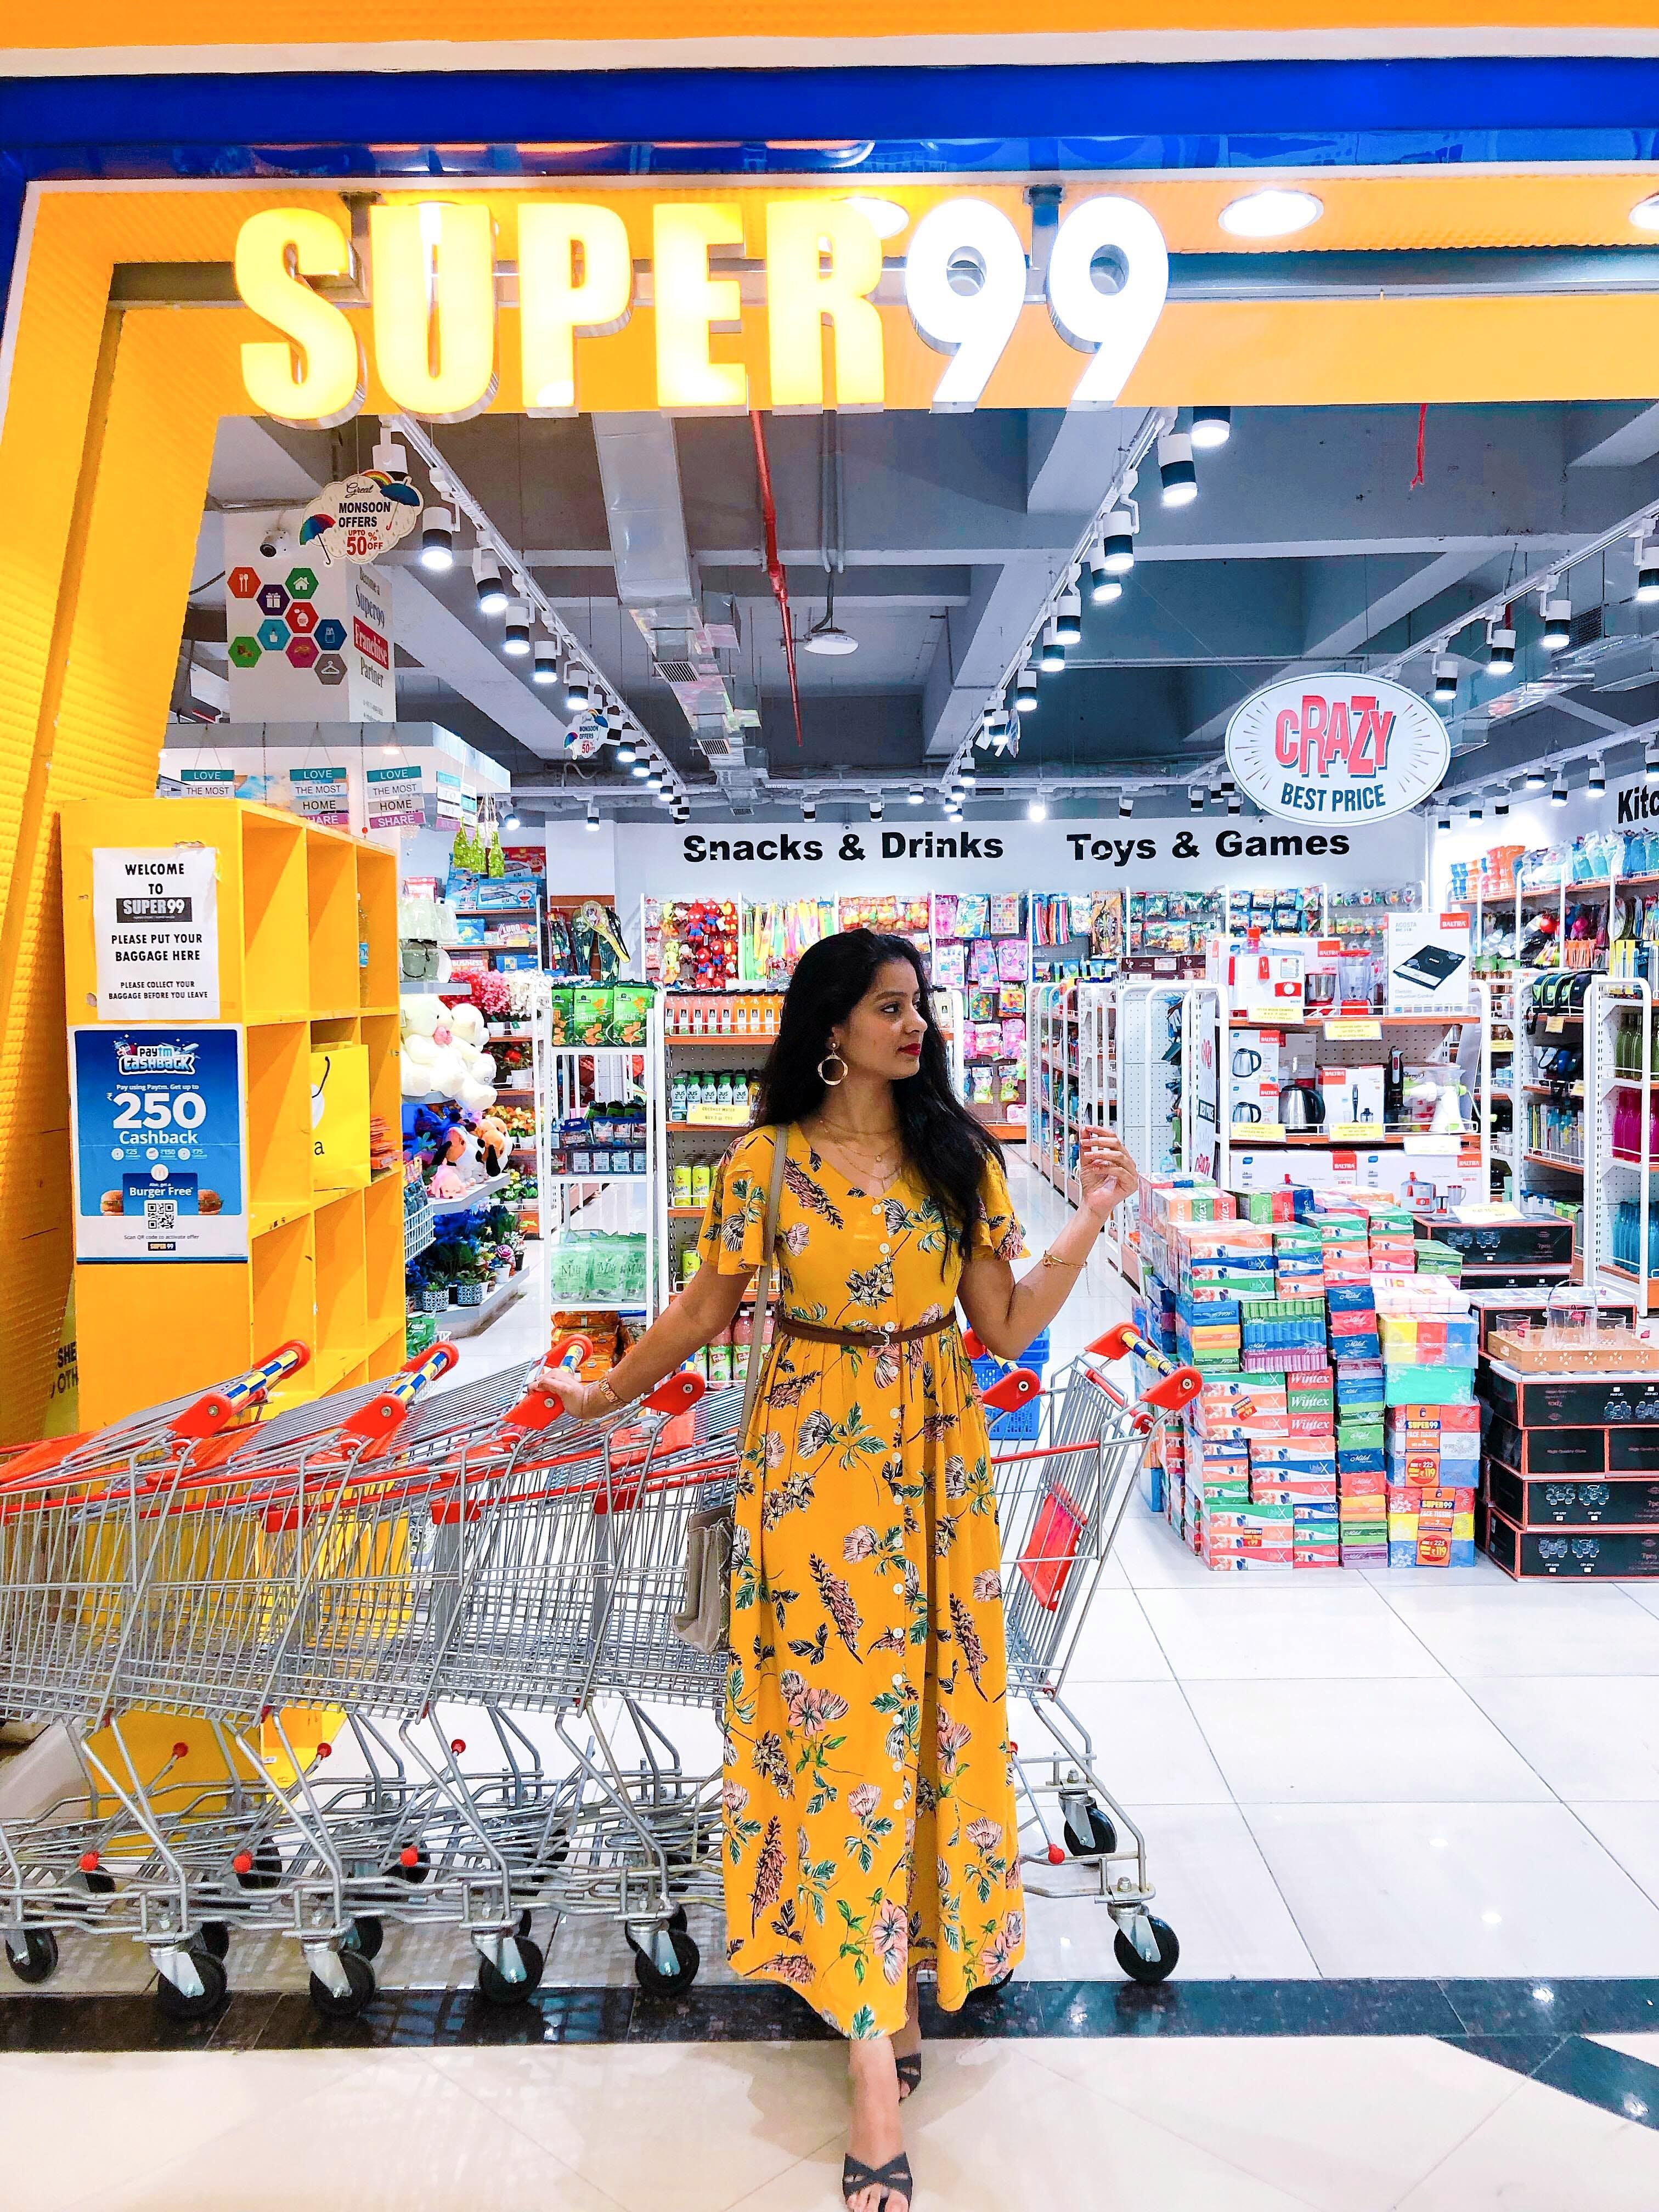 Supermarket,Yellow,Product,Retail,Shopping,Snapshot,Street fashion,Fashion,Grocery store,Footwear